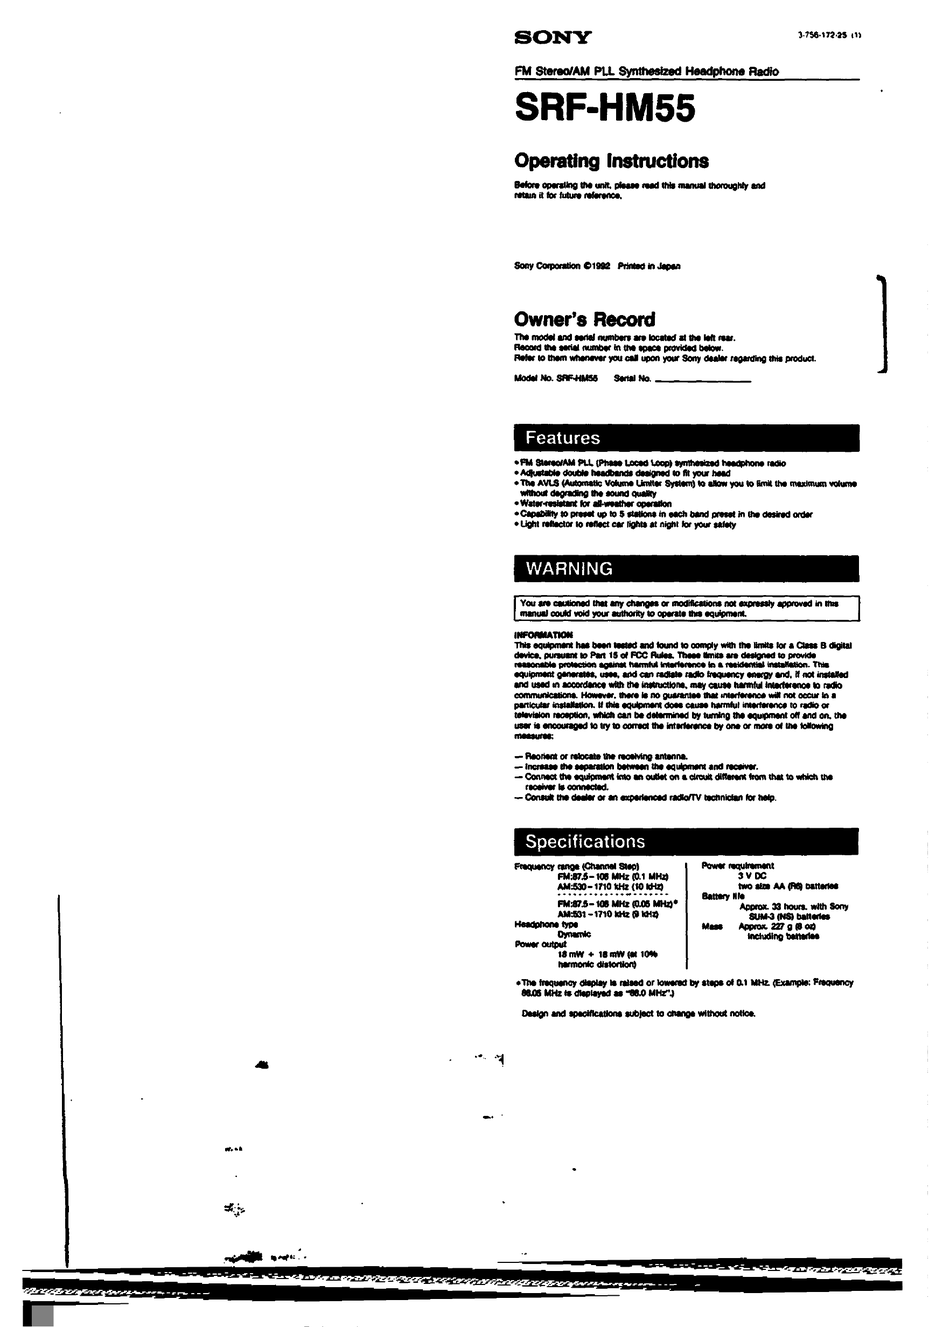 SONY WALKMAN SRF-HM55 OPERATING INSTRUCTIONS MANUAL Pdf